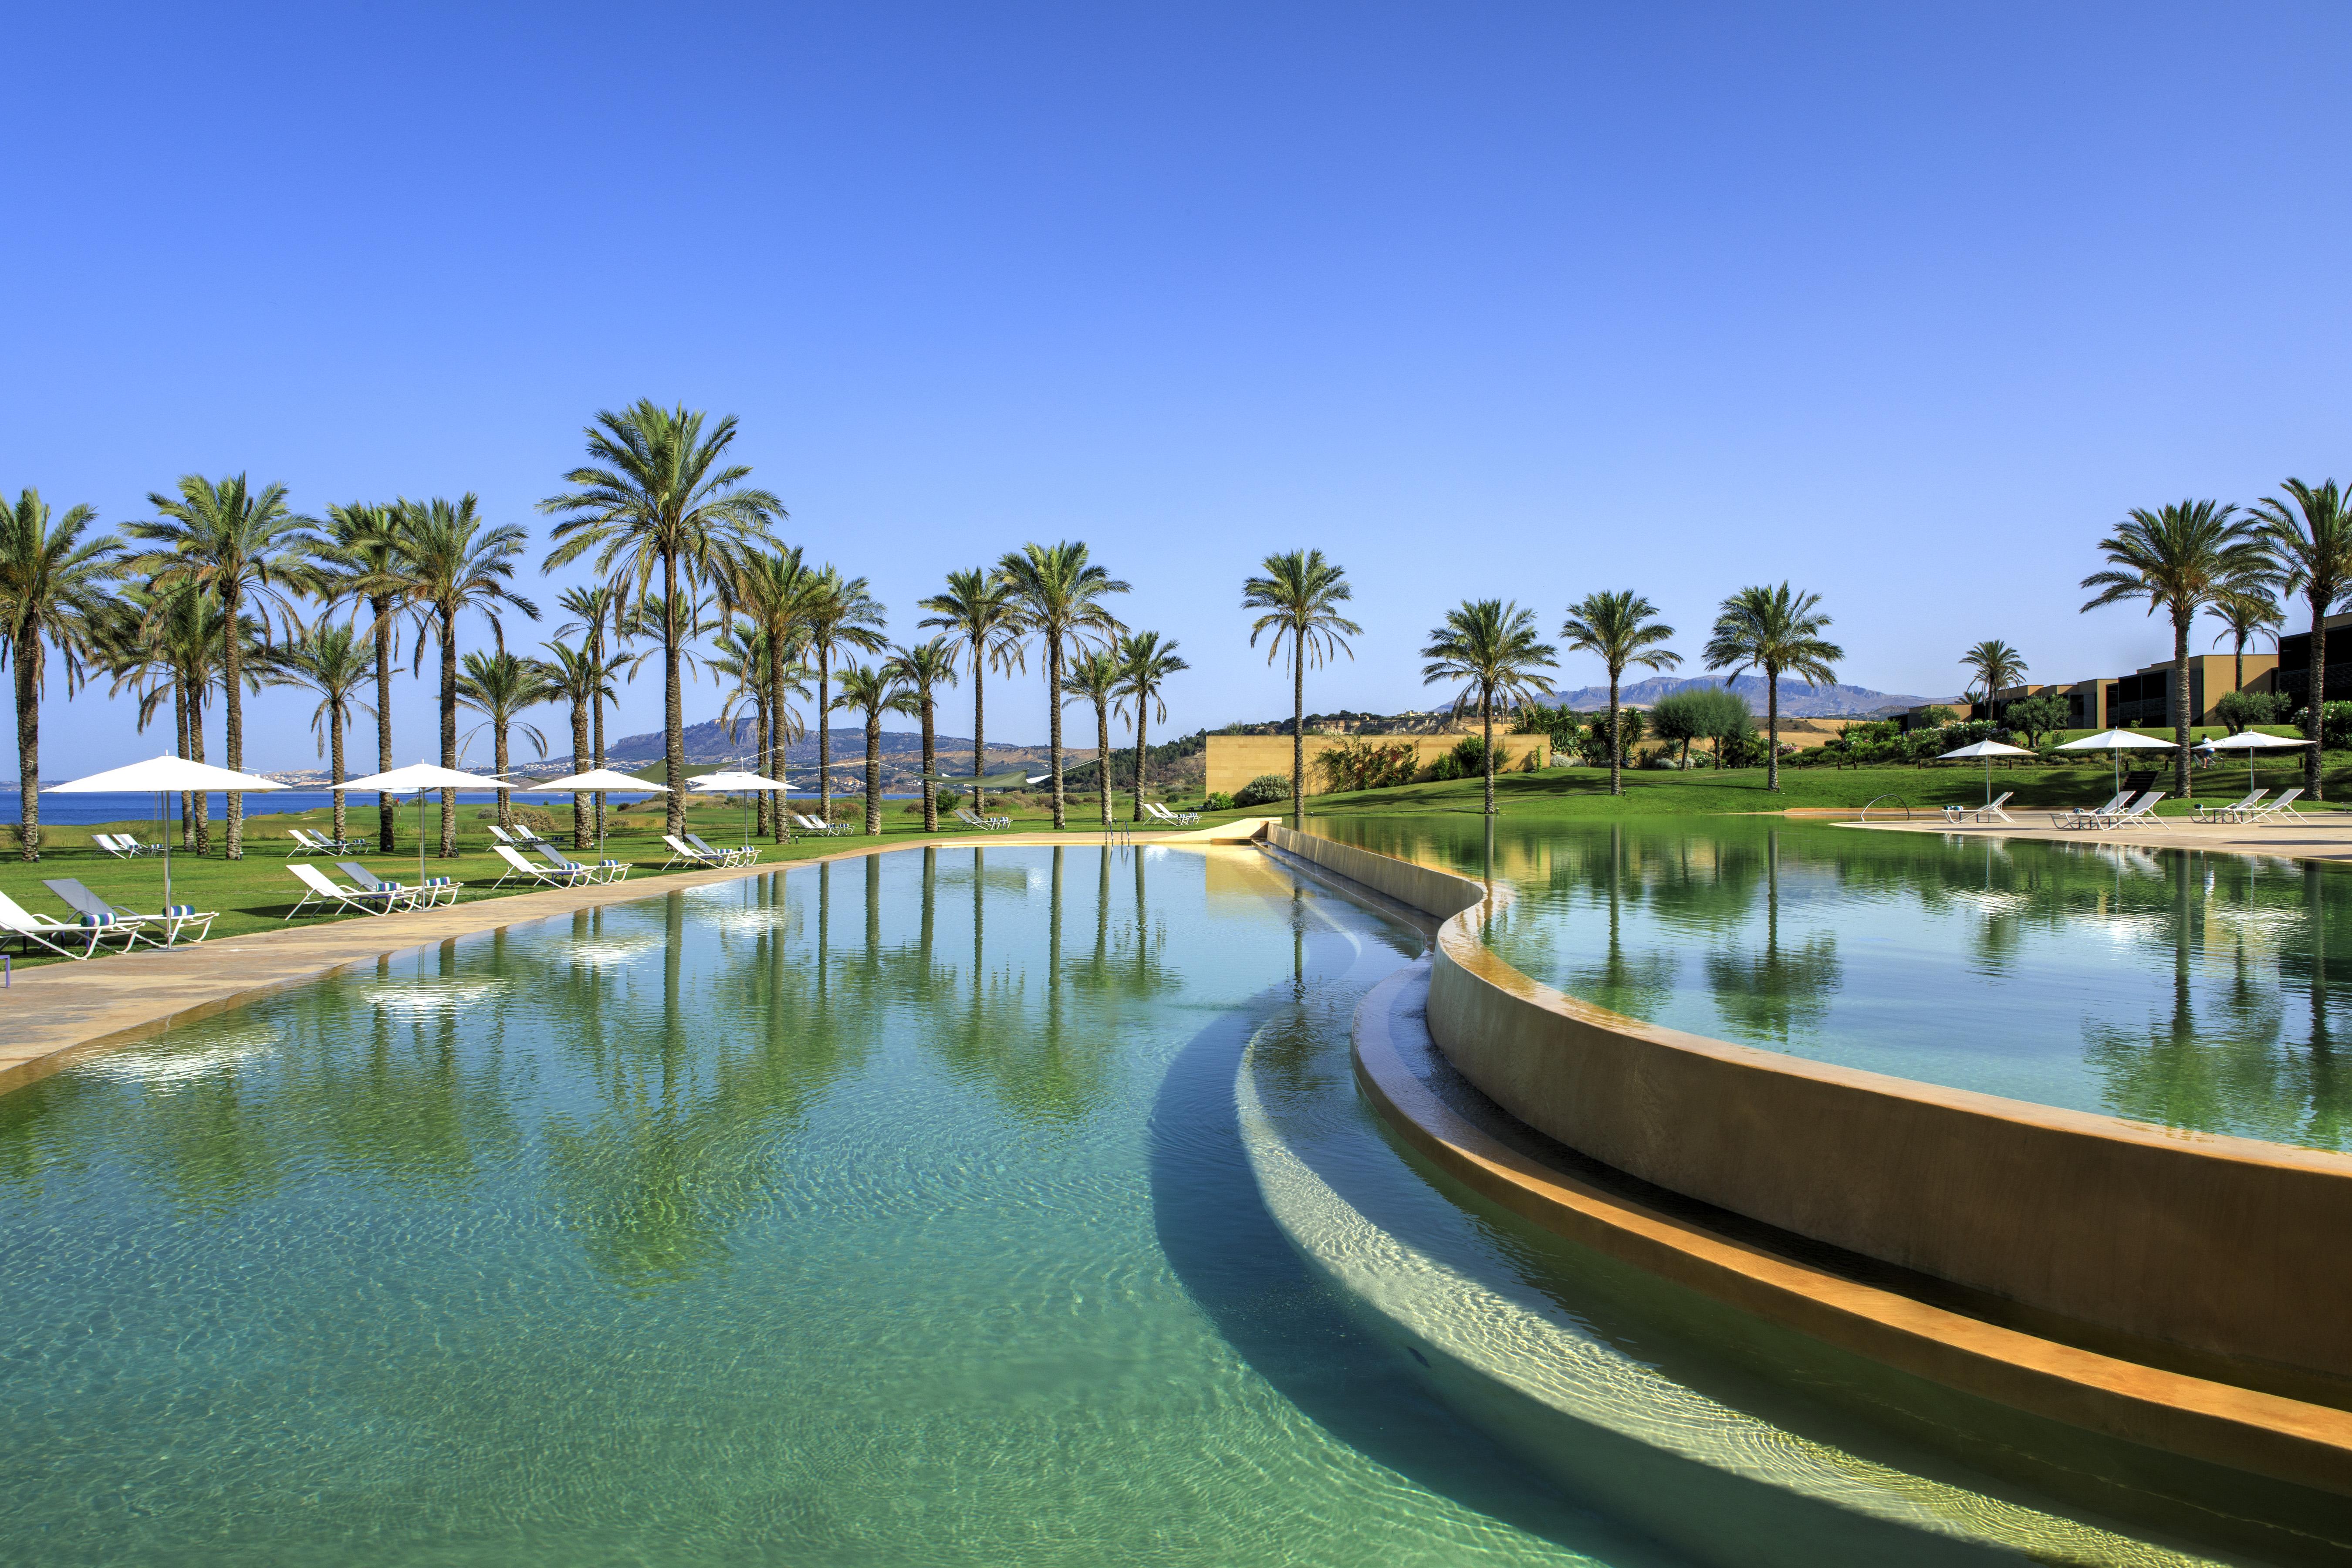 1B RFH Verdura Resort - Pool 4583 Jul 17